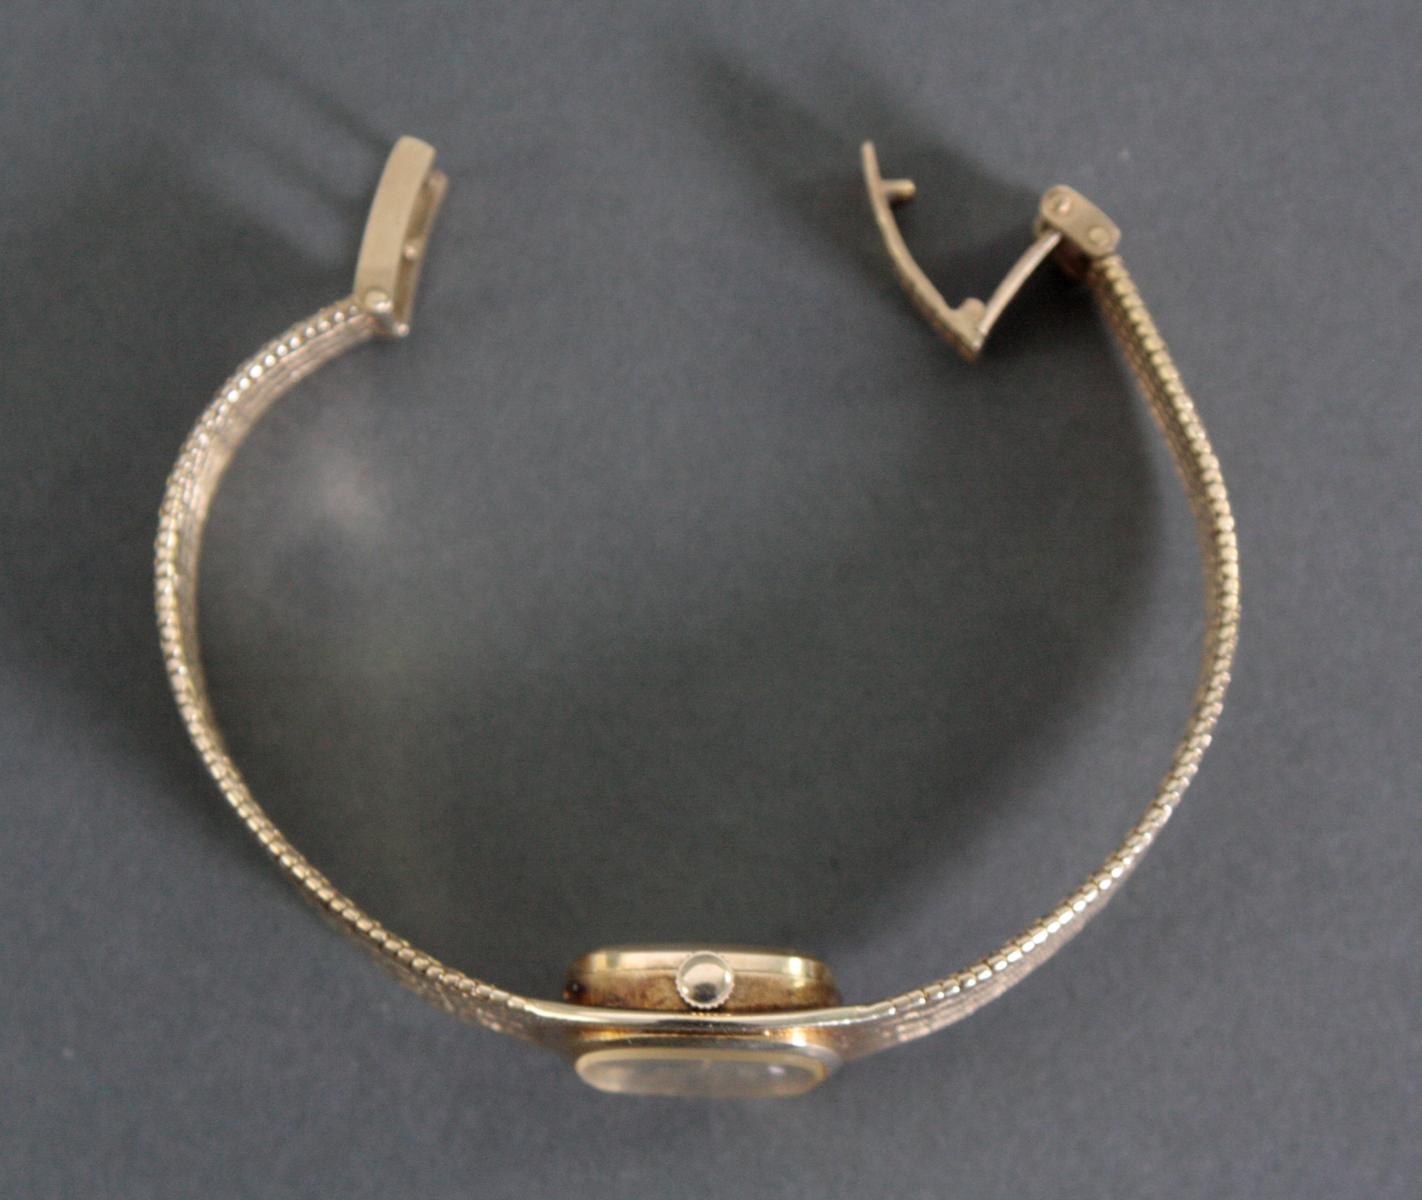 Favor Damenarmbanduhr, 14 Karat Gelbgold-4